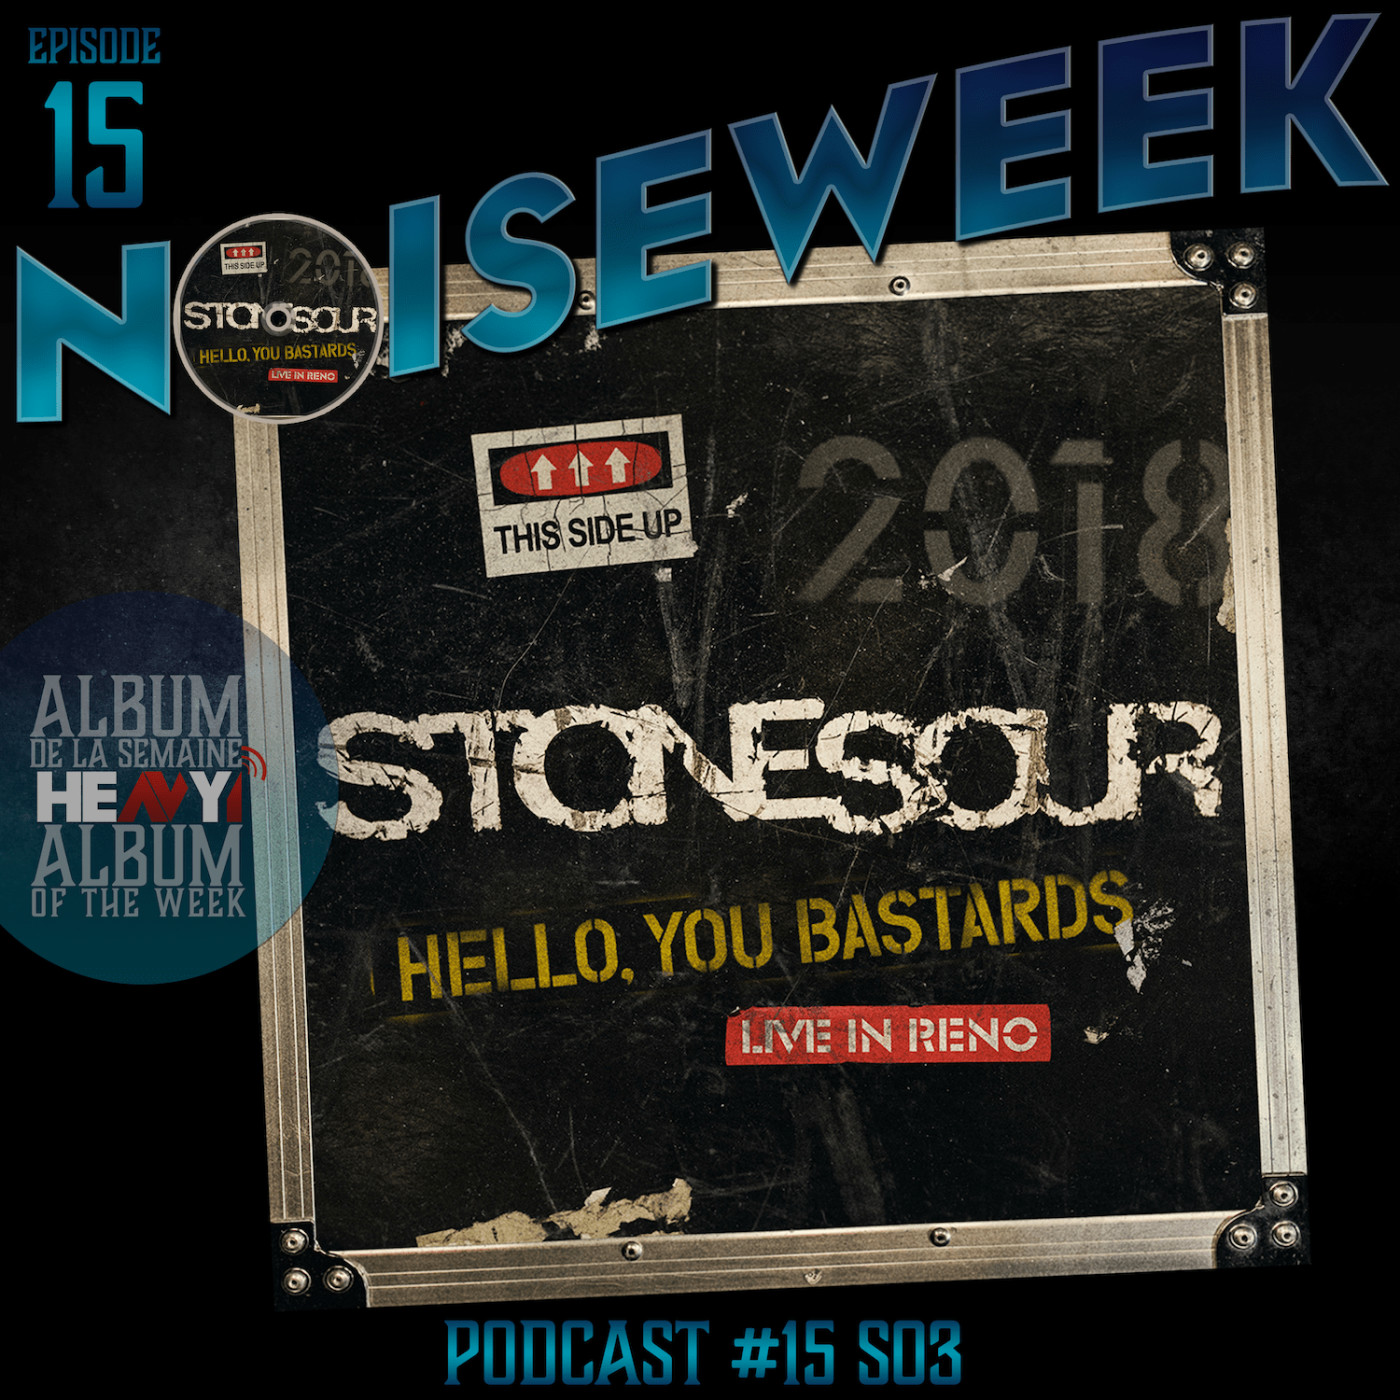 Noiseweek #15 Saison 3